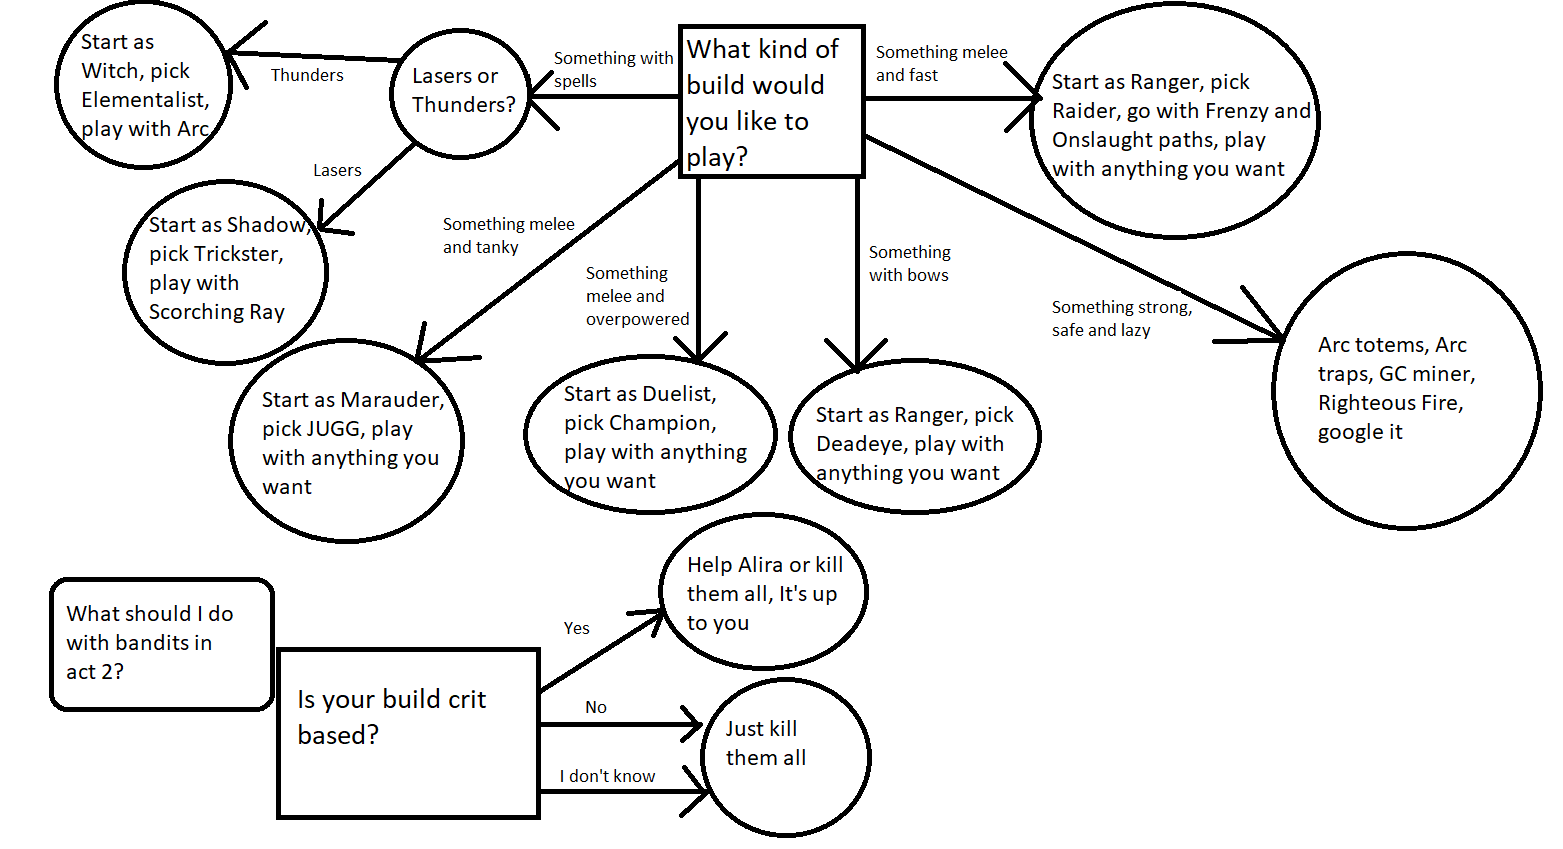 Hoa Support Scion Guide